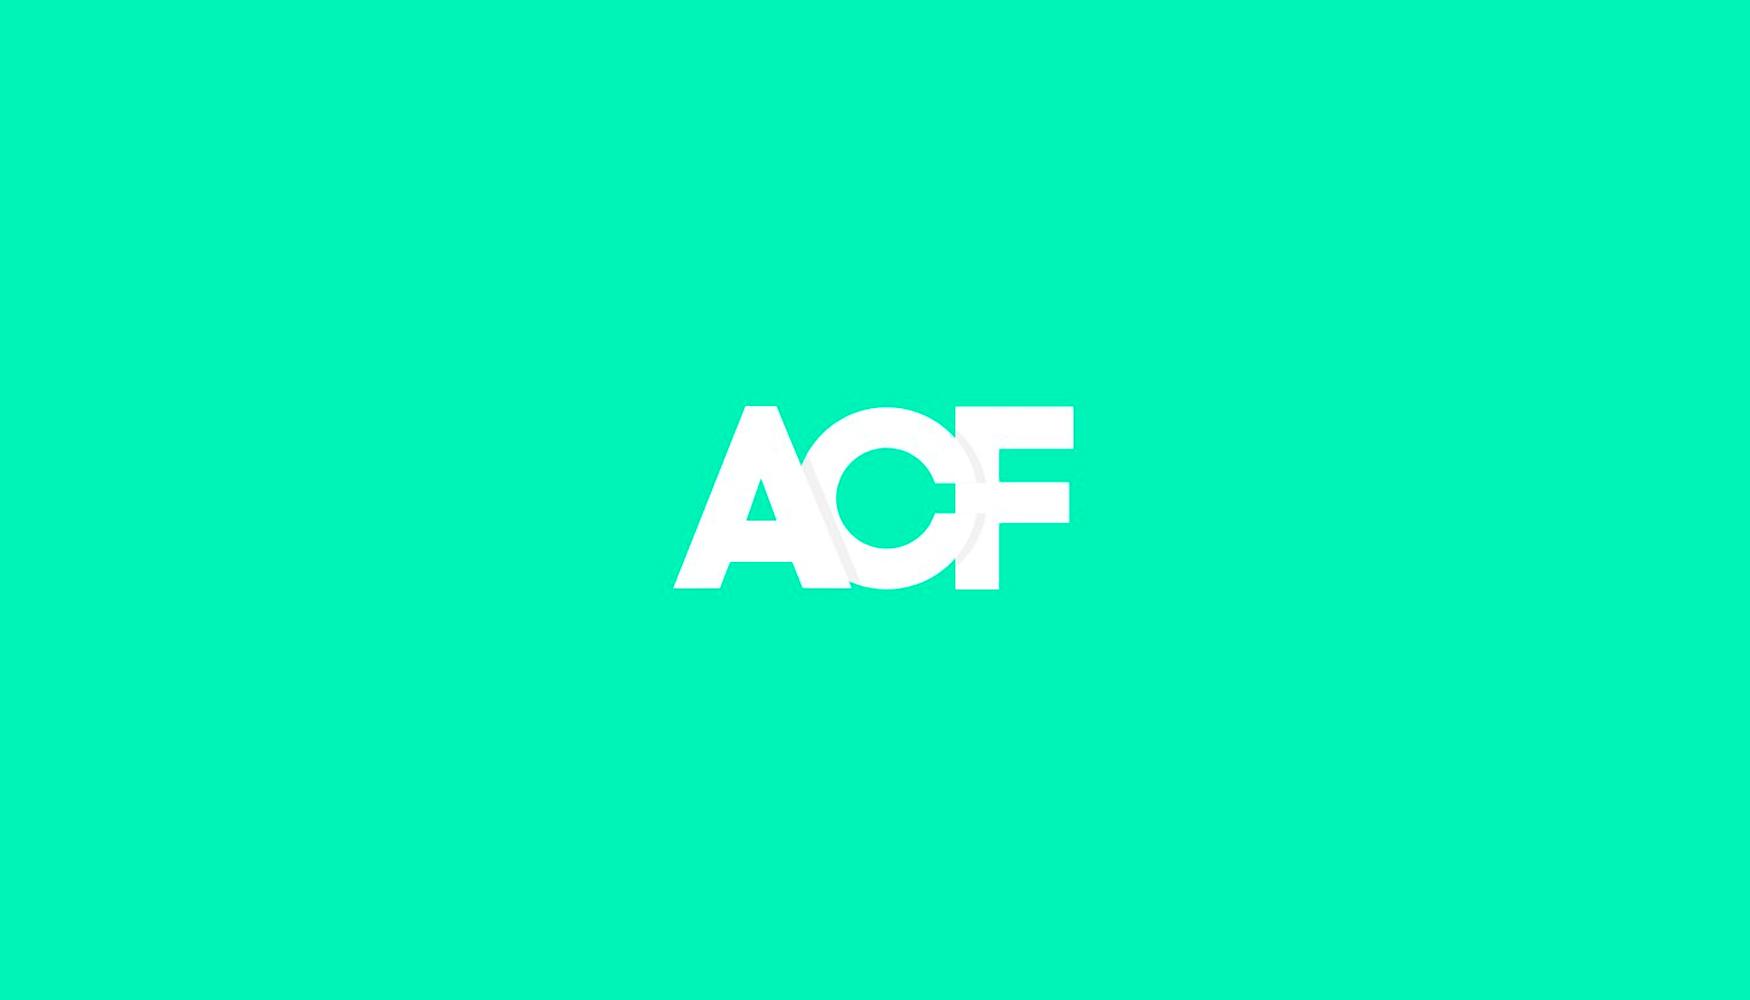 White Advanced Custom Fields Logo on bright green background